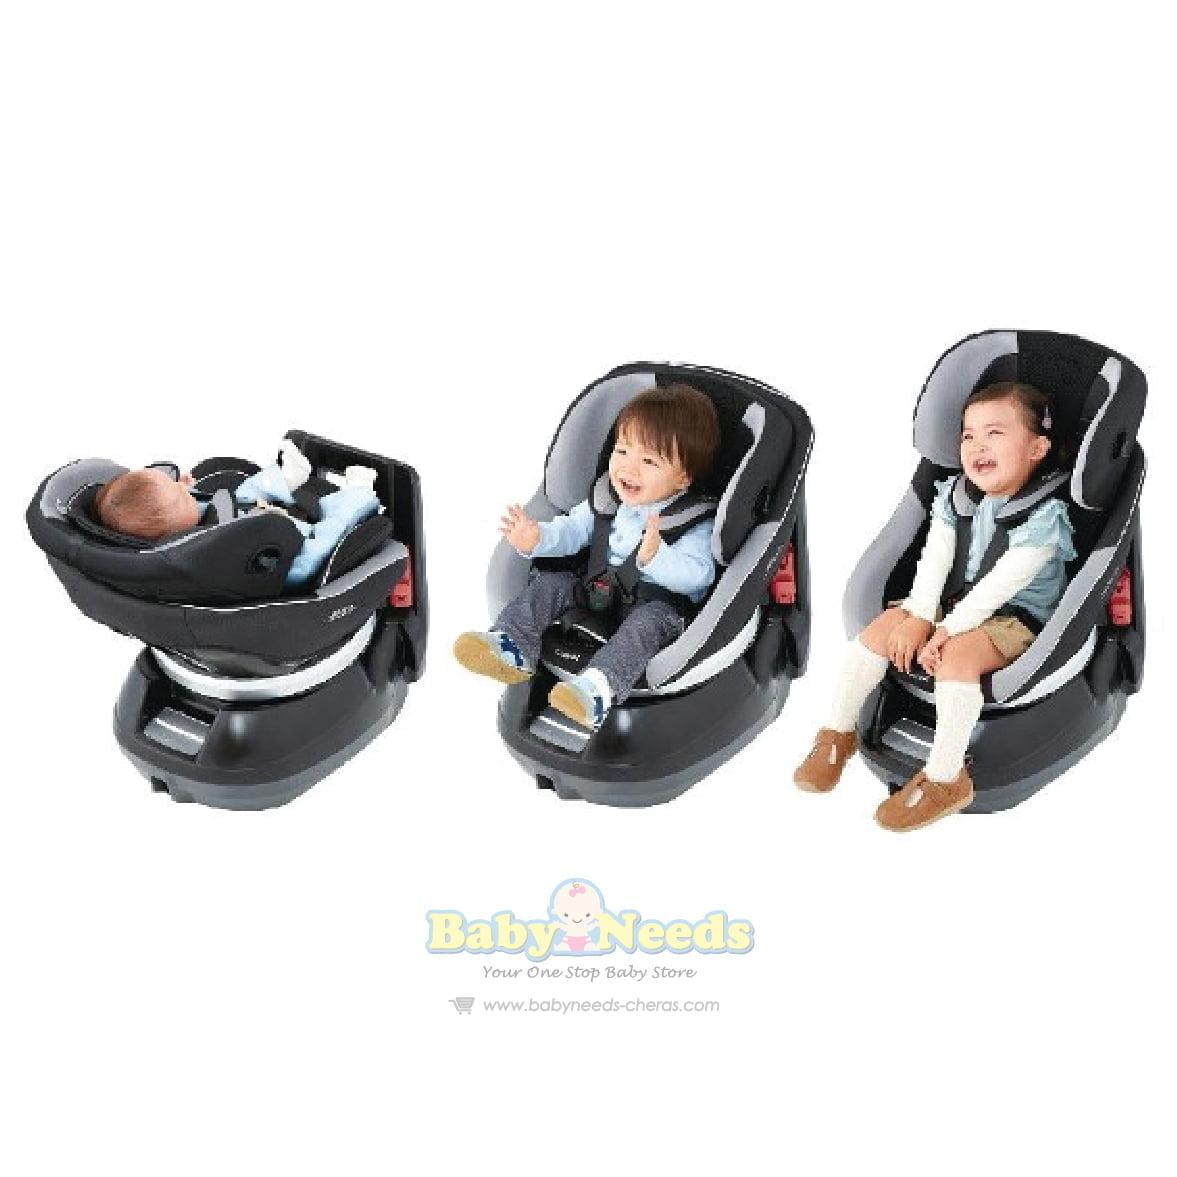 Combi Cradling 360 Convertible Car Seat Baby Needs